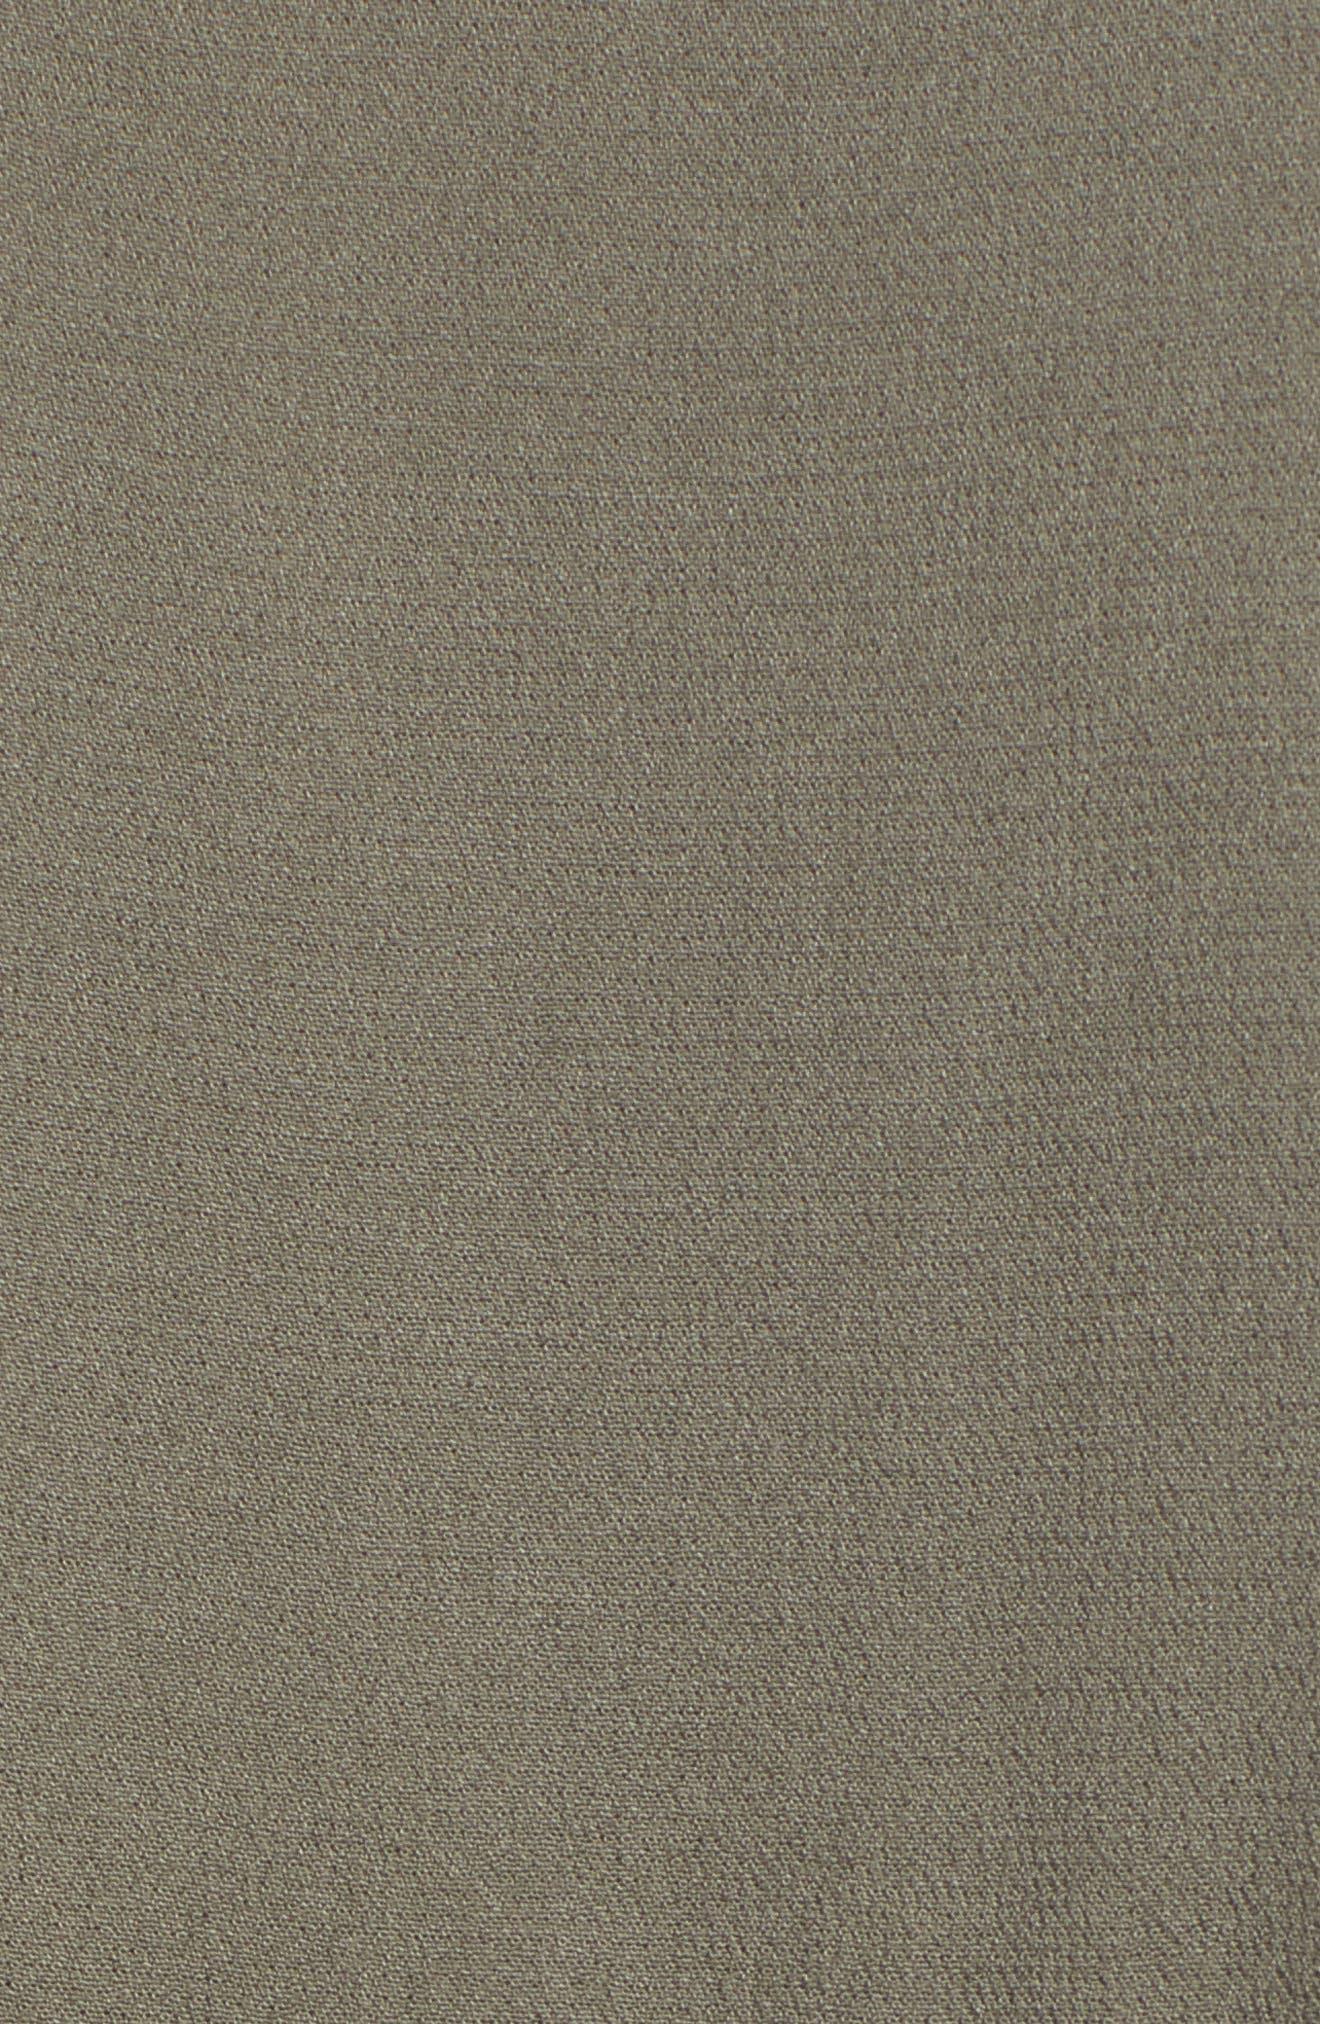 Embellished Tie Front Blouse,                             Alternate thumbnail 5, color,                             345